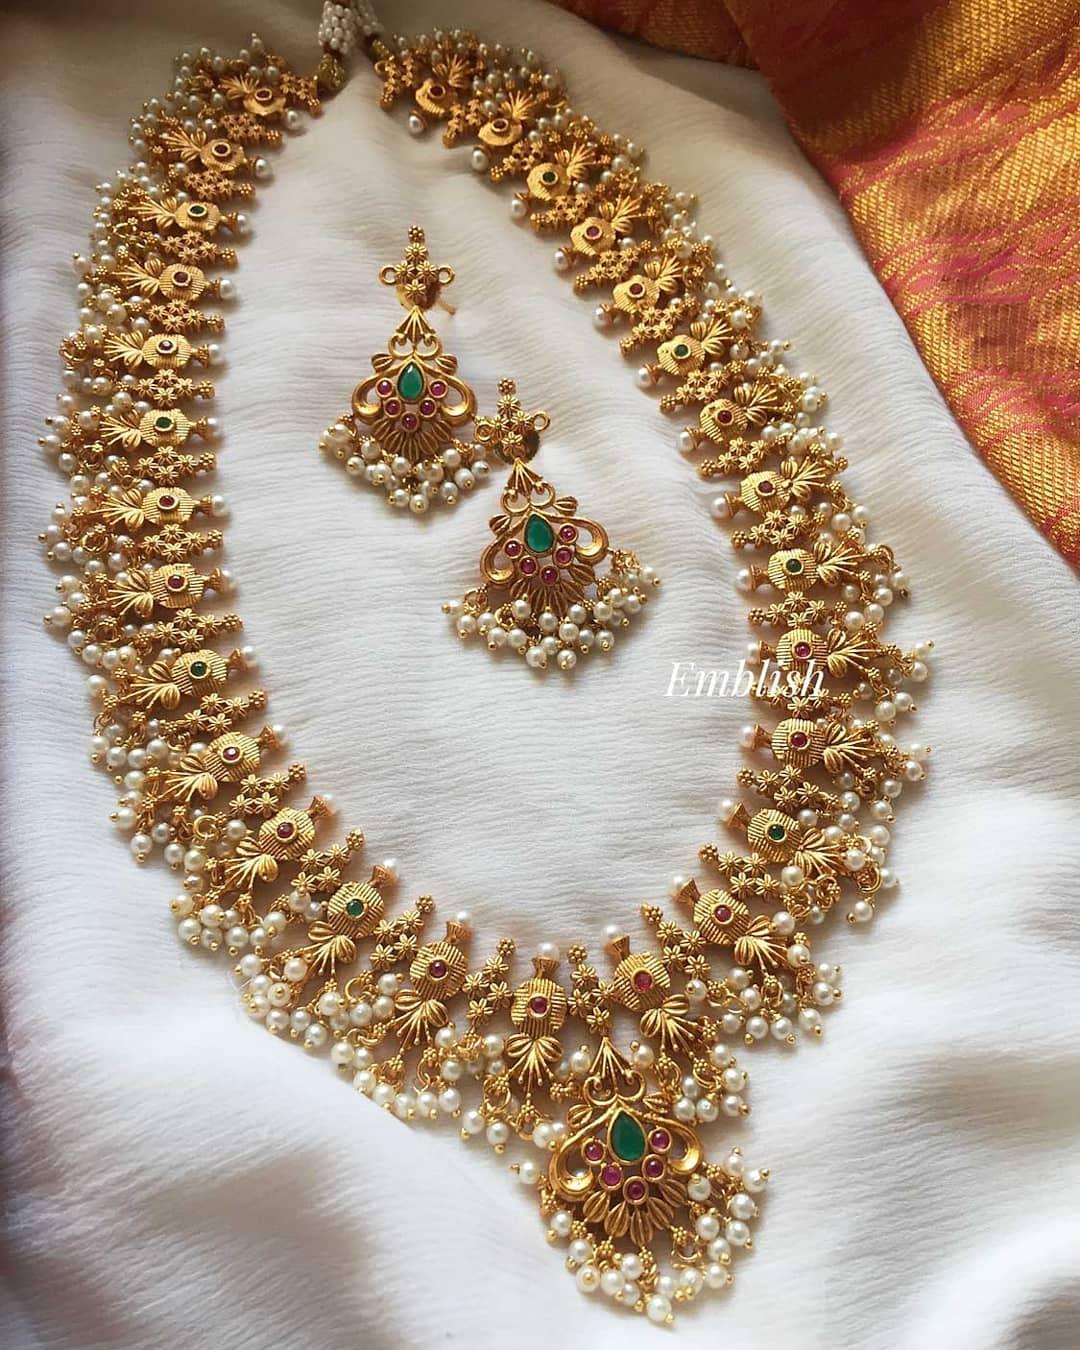 flower-design-midlength-guttapusalu-necklace